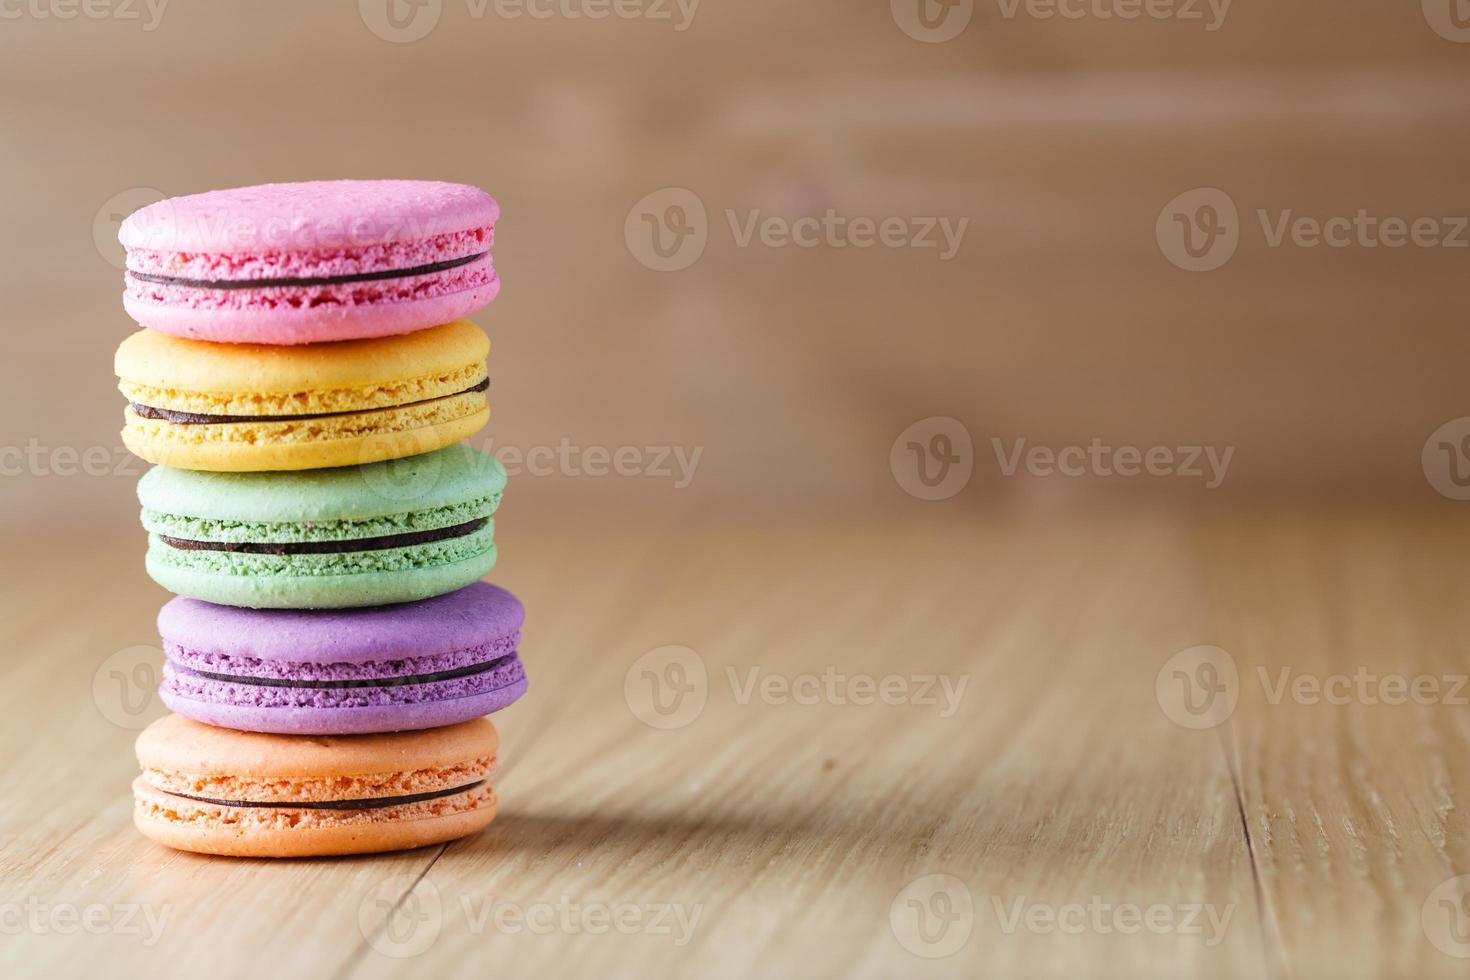 cinq macaron français coloré photo